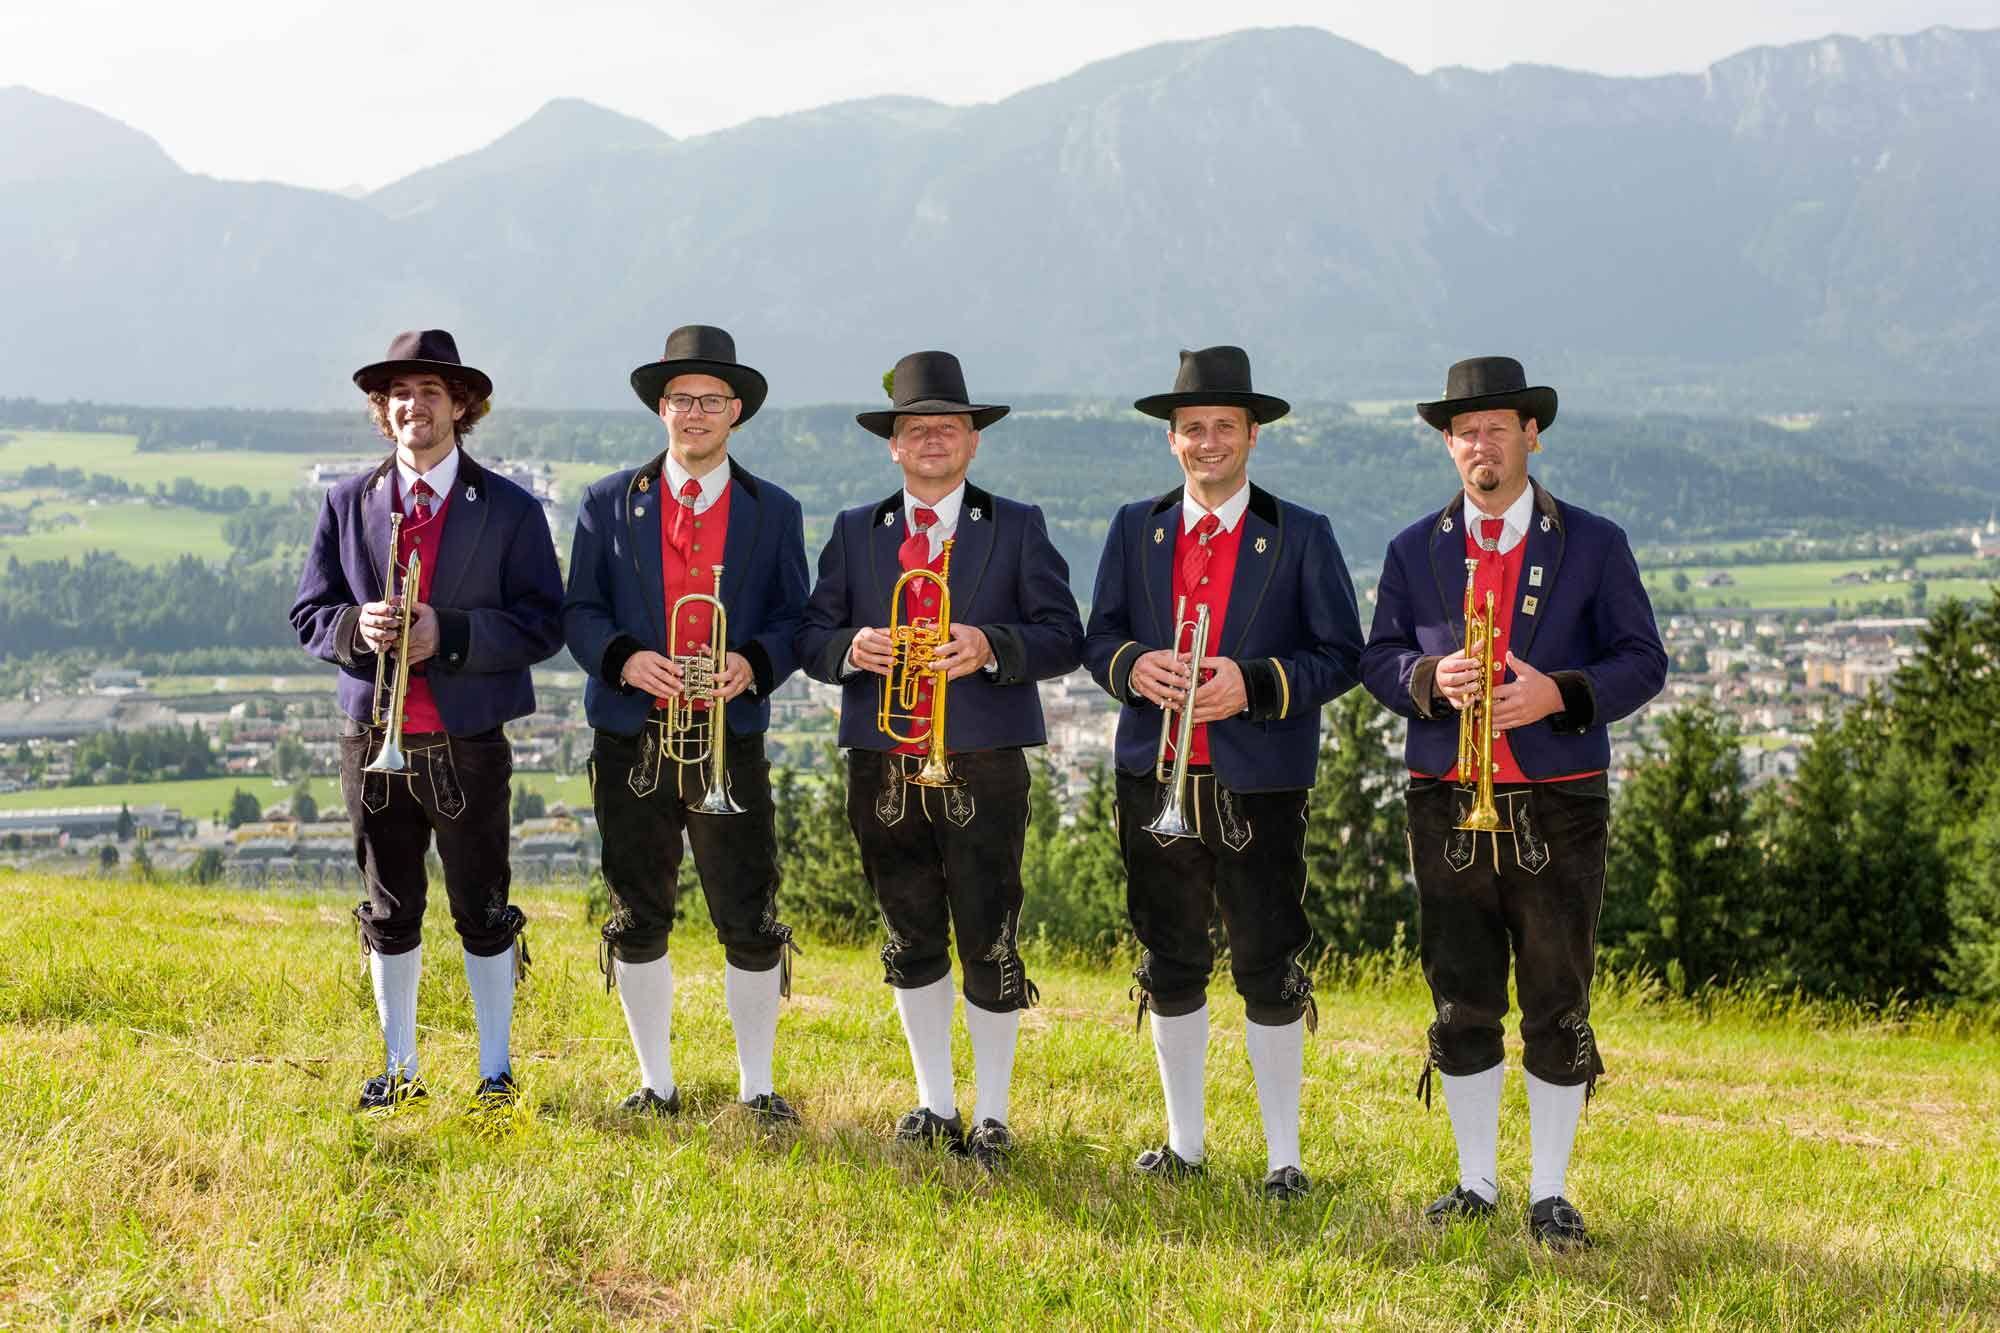 Trompete: Michael Stocker, Christoph Kaindl, Jakob Unterberger, Klaus Unterberger, Robert Silberberger